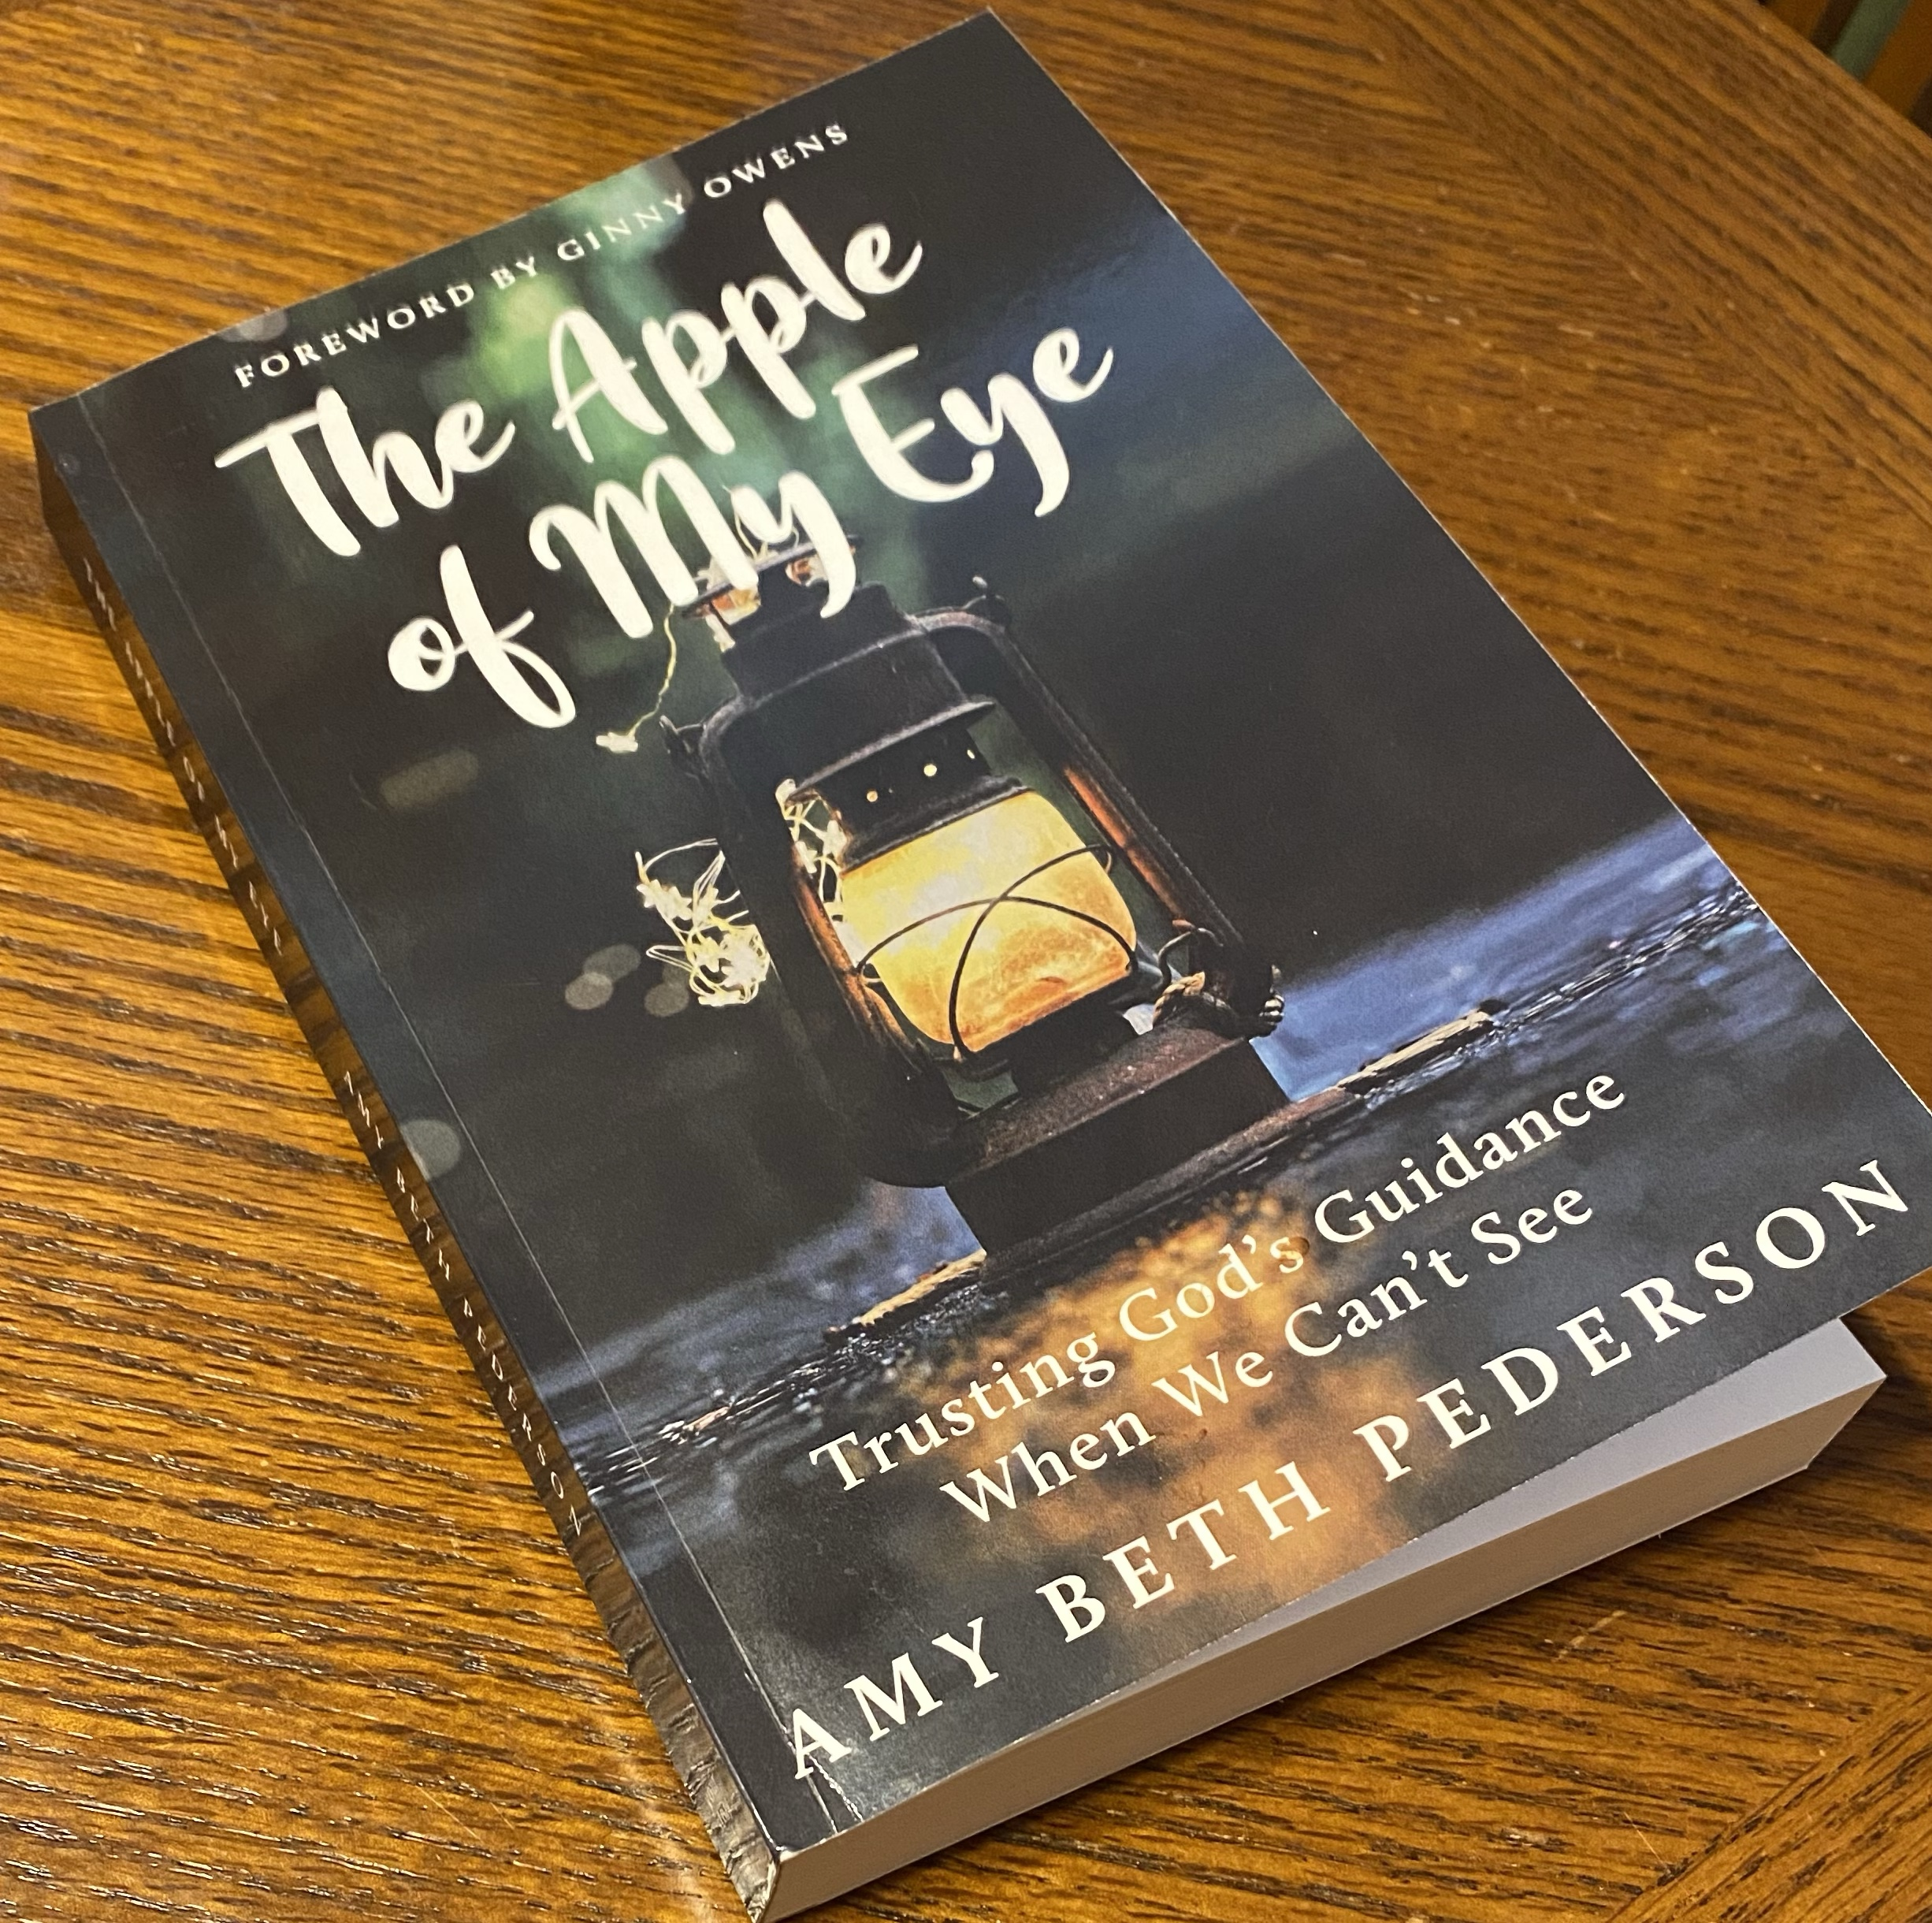 The Apple of My Eye by Amy Beth Petersen